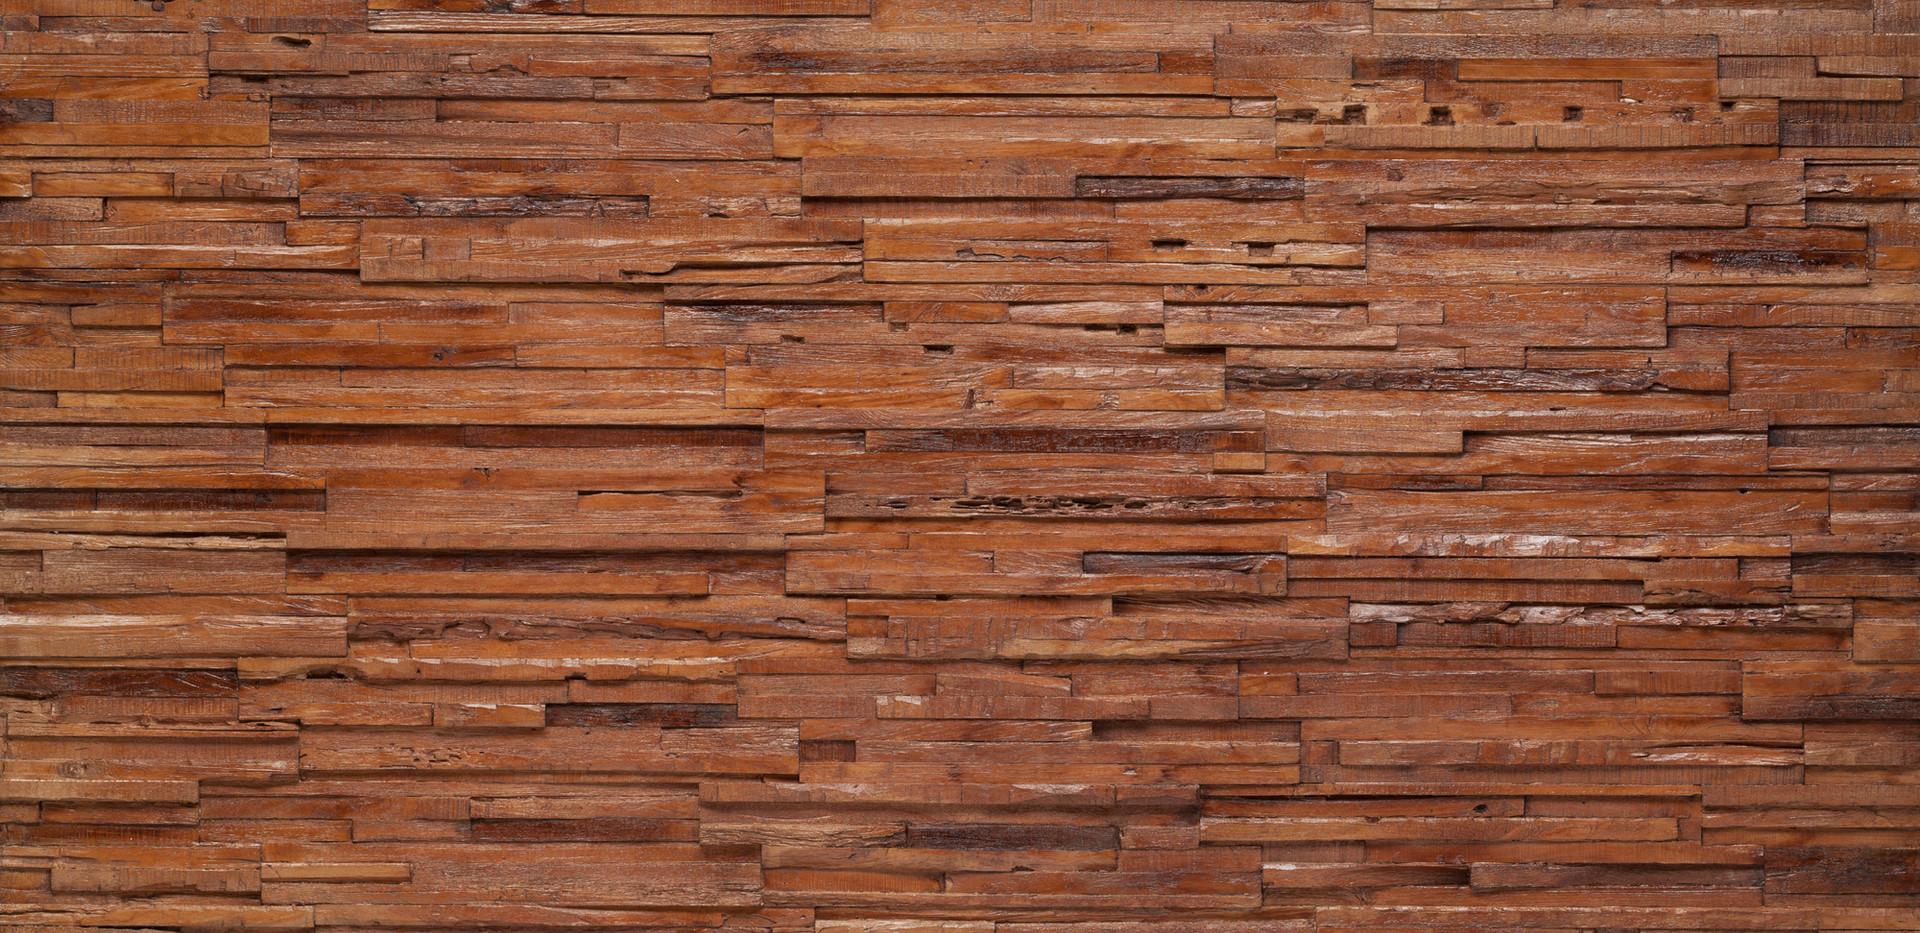 Plywood - Avellana (401)